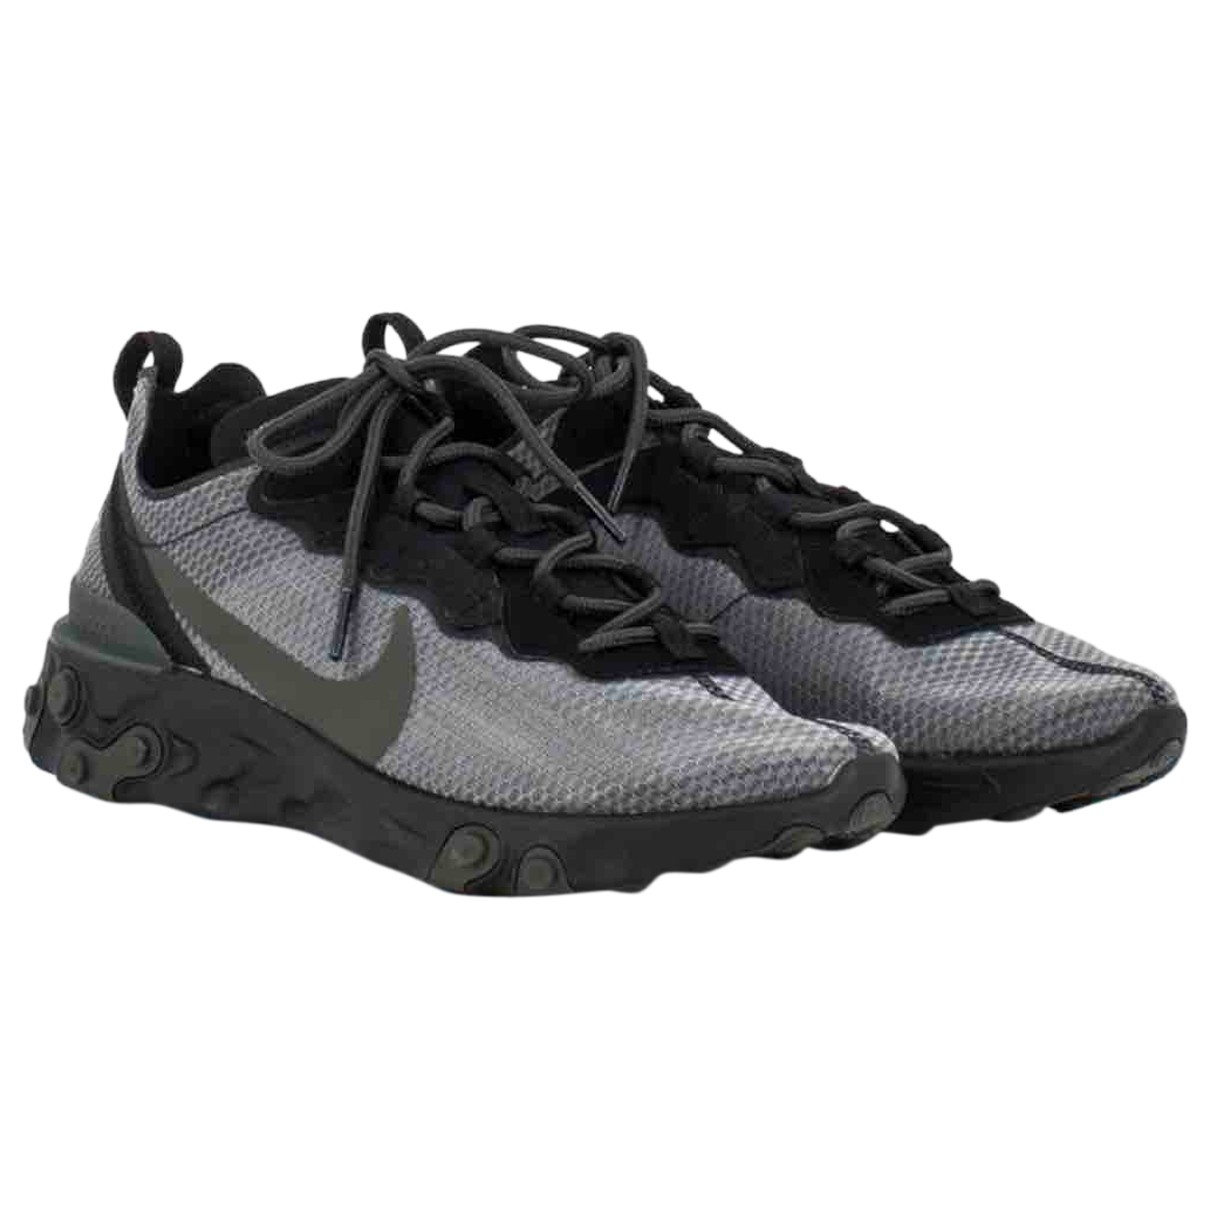 Nike React element 55 Sneakers in  Grau Leinen